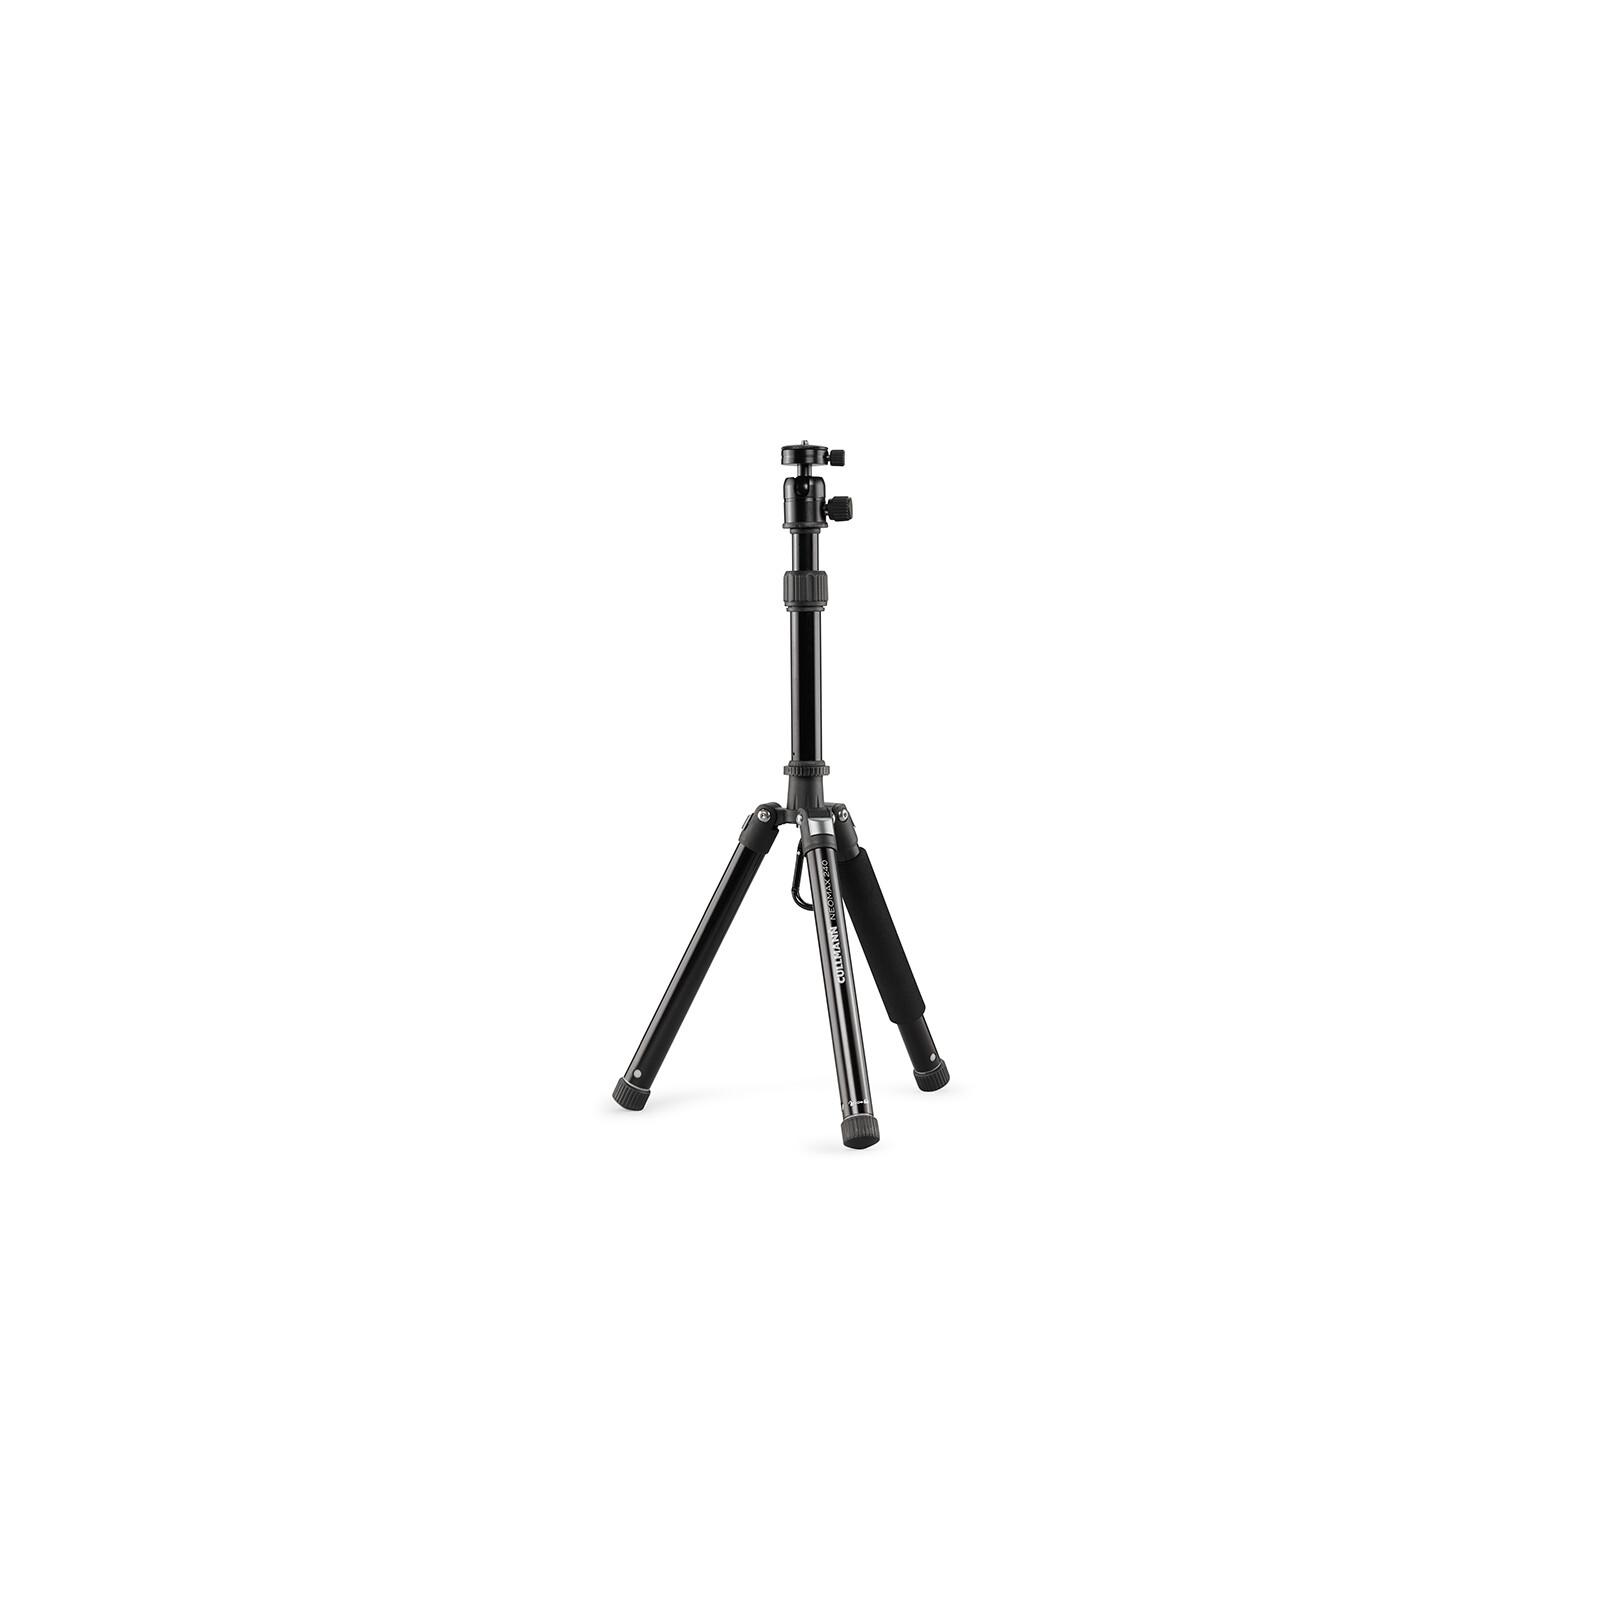 Cullmann Neomax 240 Stativ schwarz